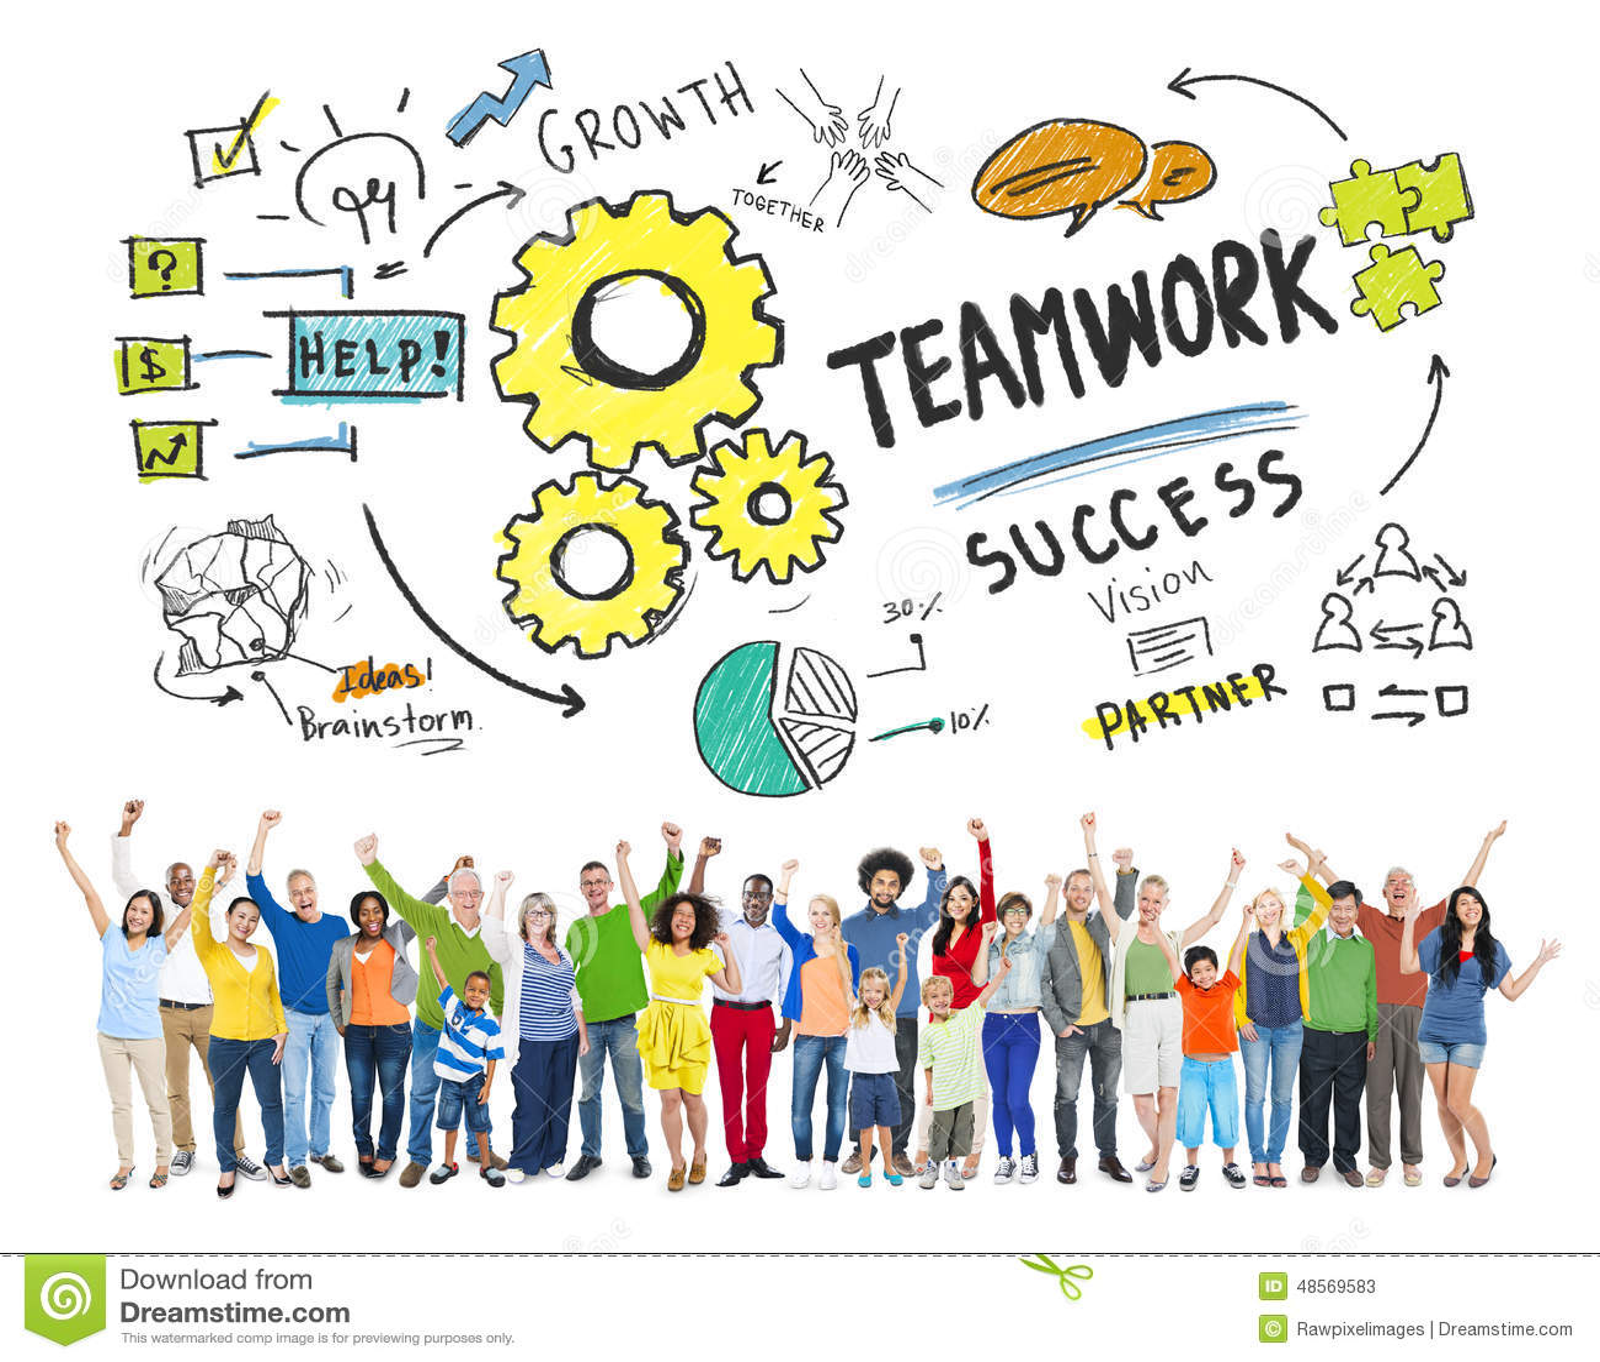 ... Collaboration People Celebration Concept Stock Photo - Image: 48569583